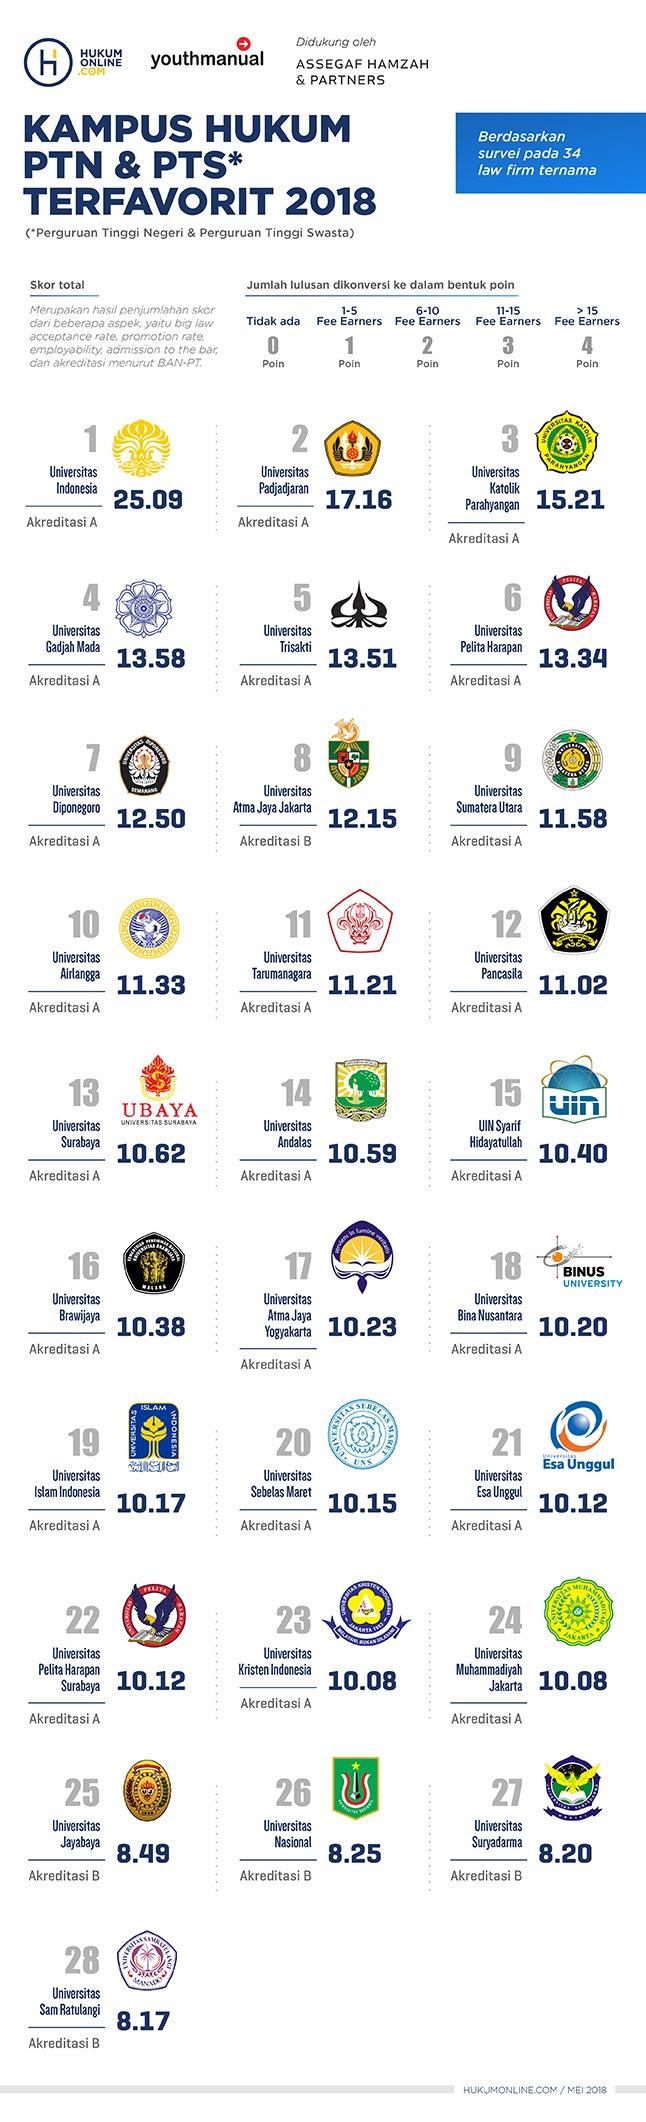 Universitas Swasta Di Yogyakarta : universitas, swasta, yogyakarta, Daftar, Perguruan, Tinggi, Yogyakarta, Seputaran